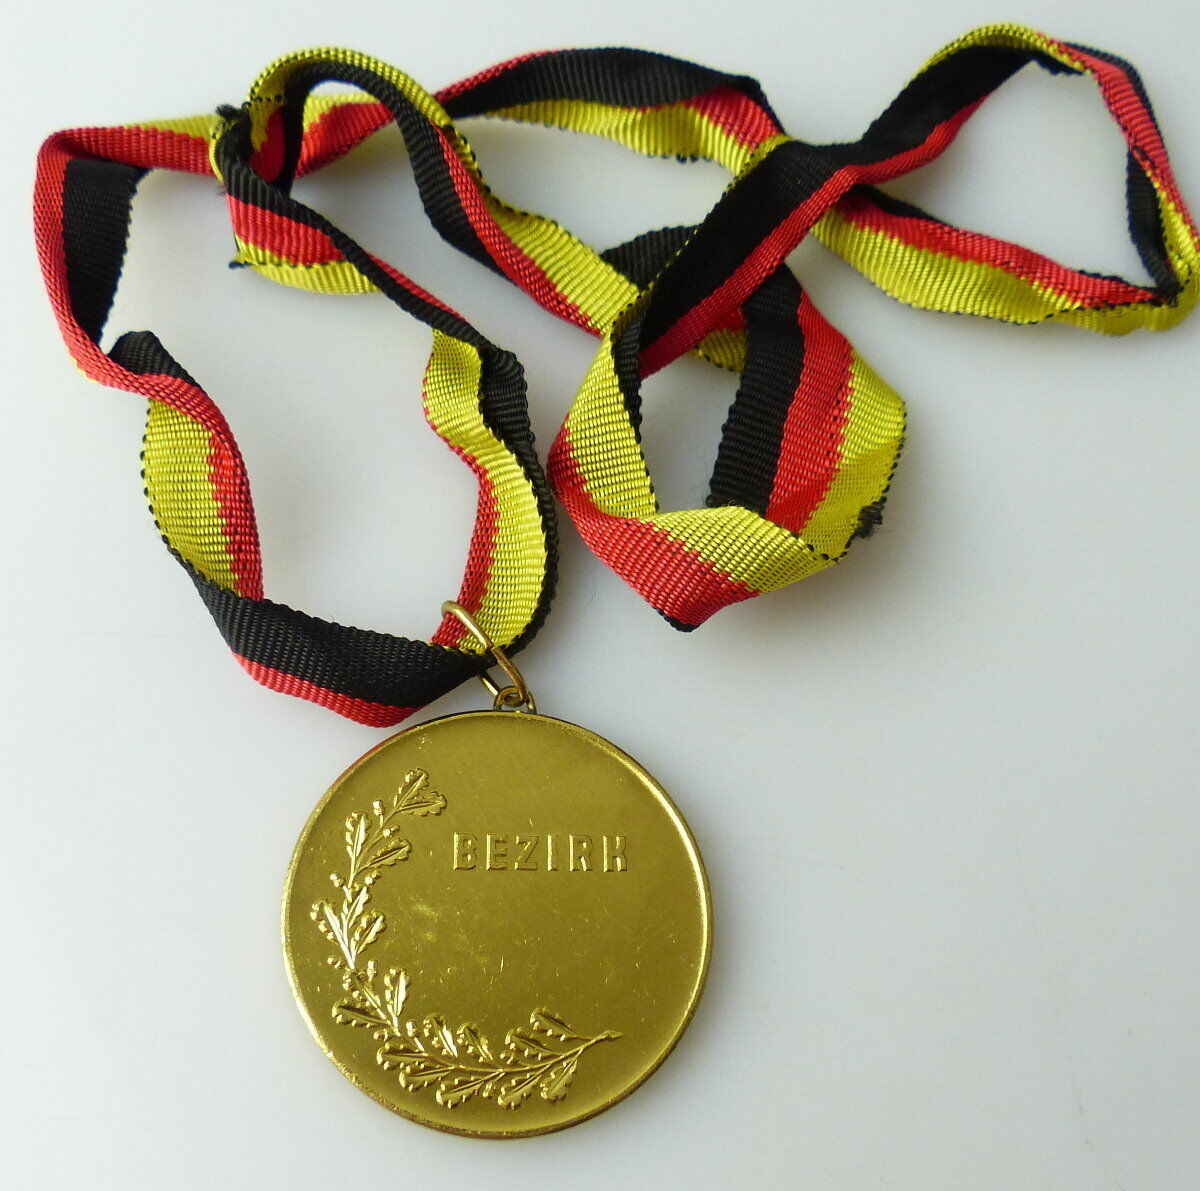 Medaille Spartakiade der Kampfgruppen 1966 r367